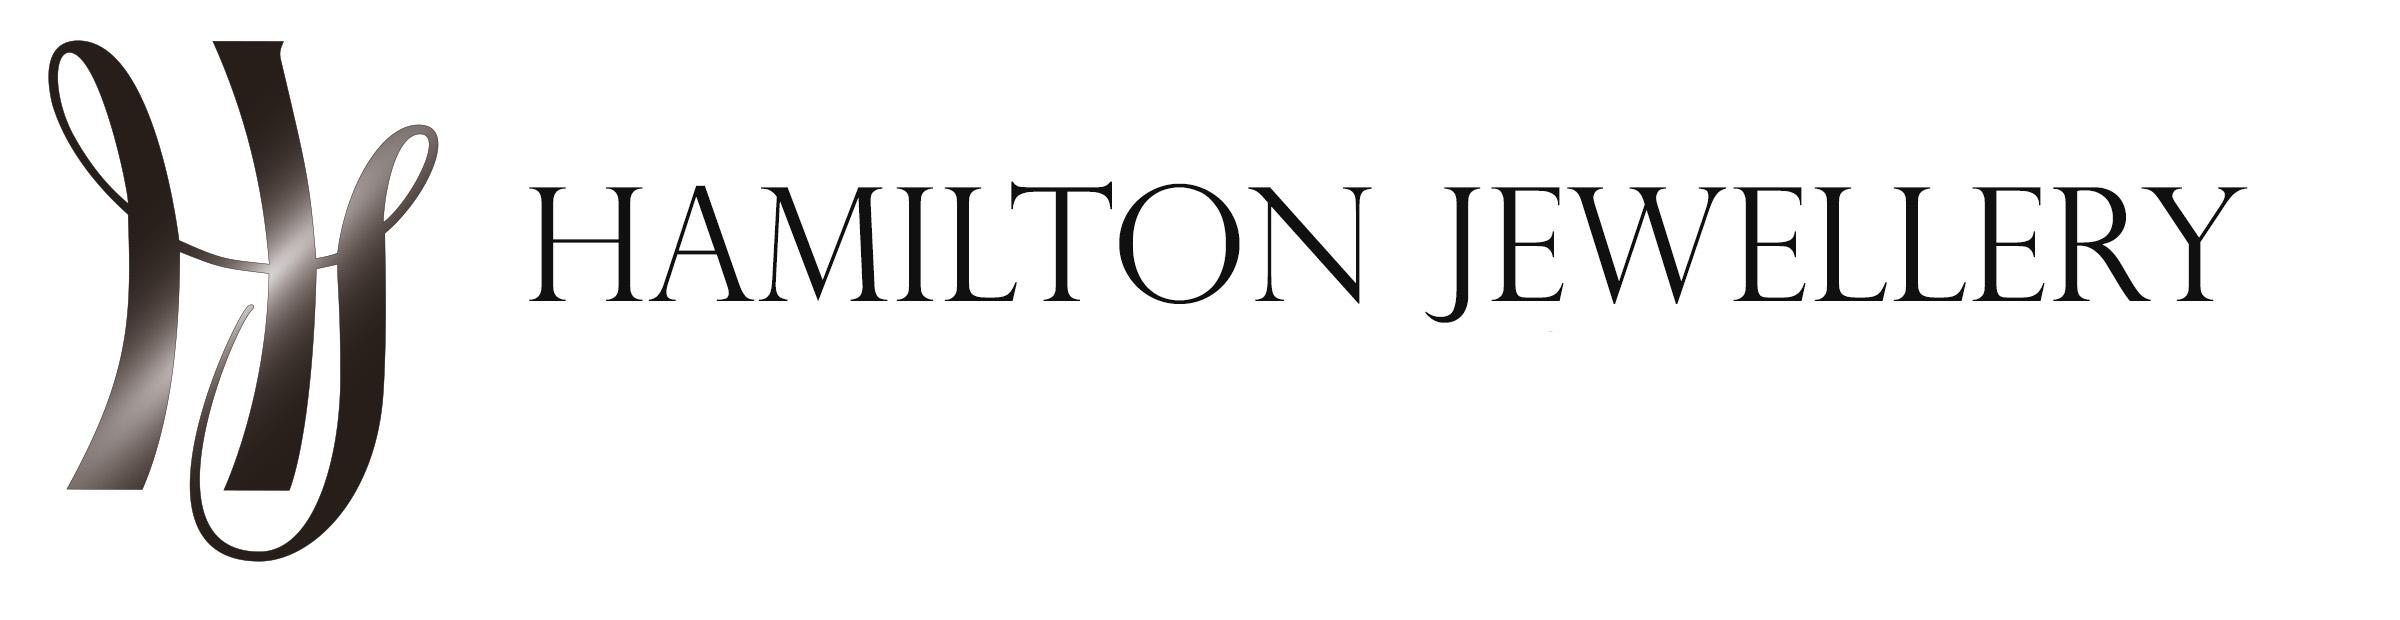 Hamilton Jewellery